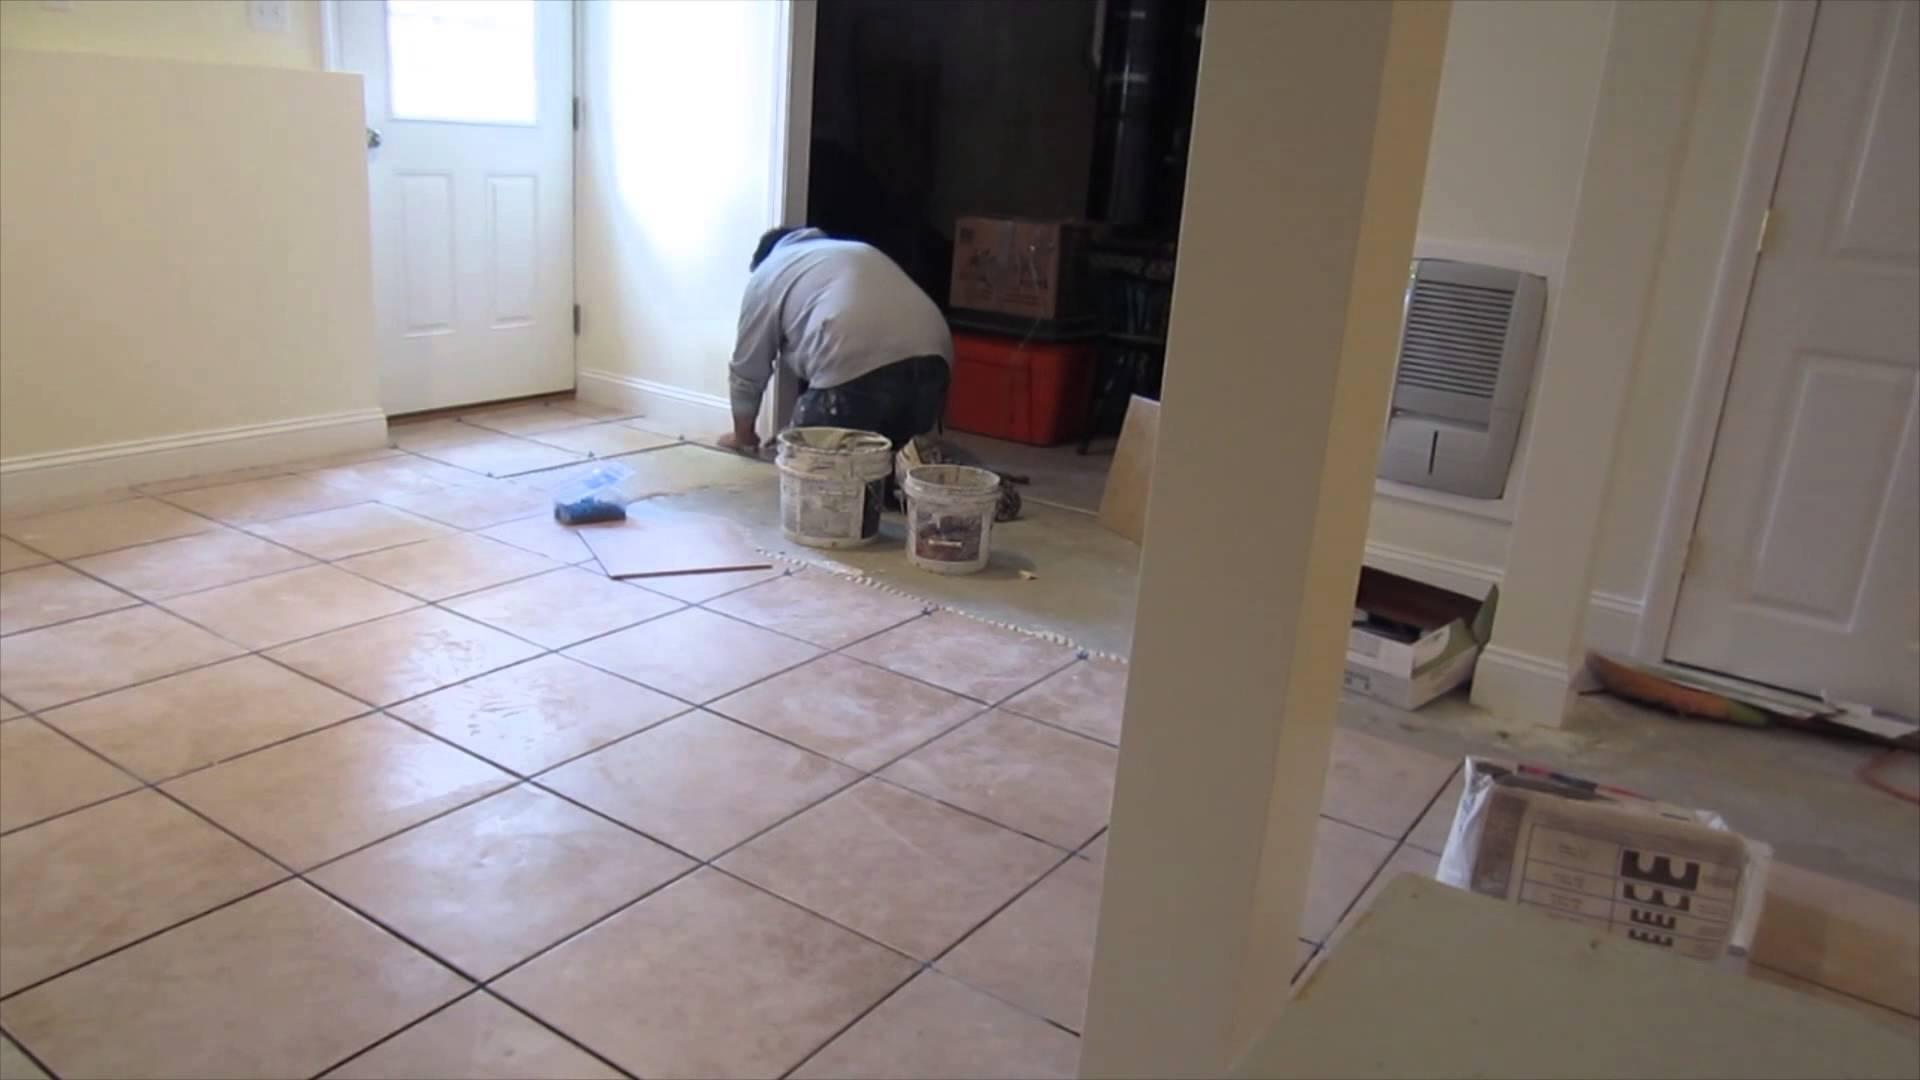 Porcelain Or Ceramic Tile For Basement Floor